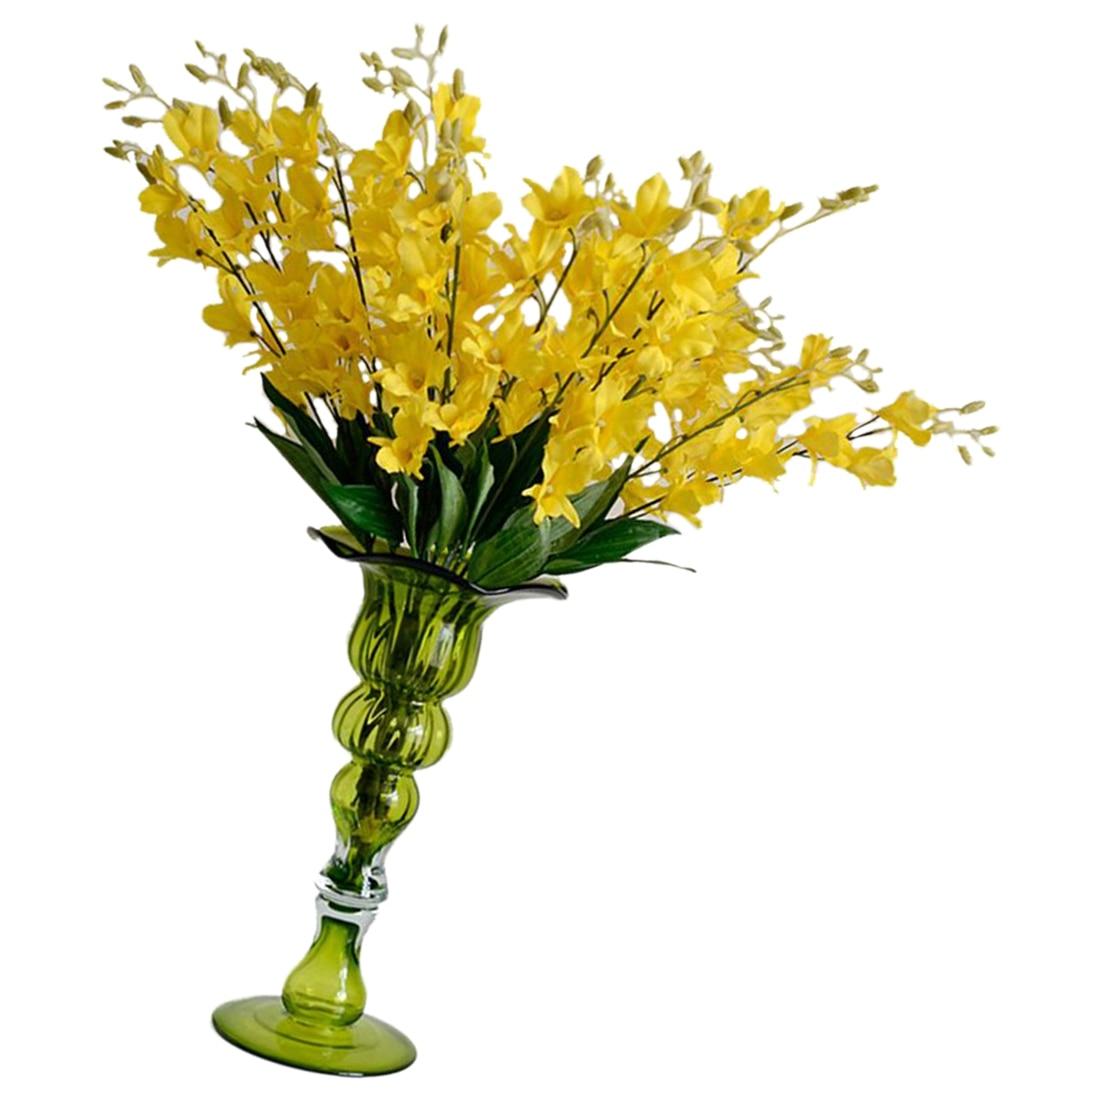 Uesh 5pcs High Quality Artificial Phalaenopsis Orchid Flowers Silk